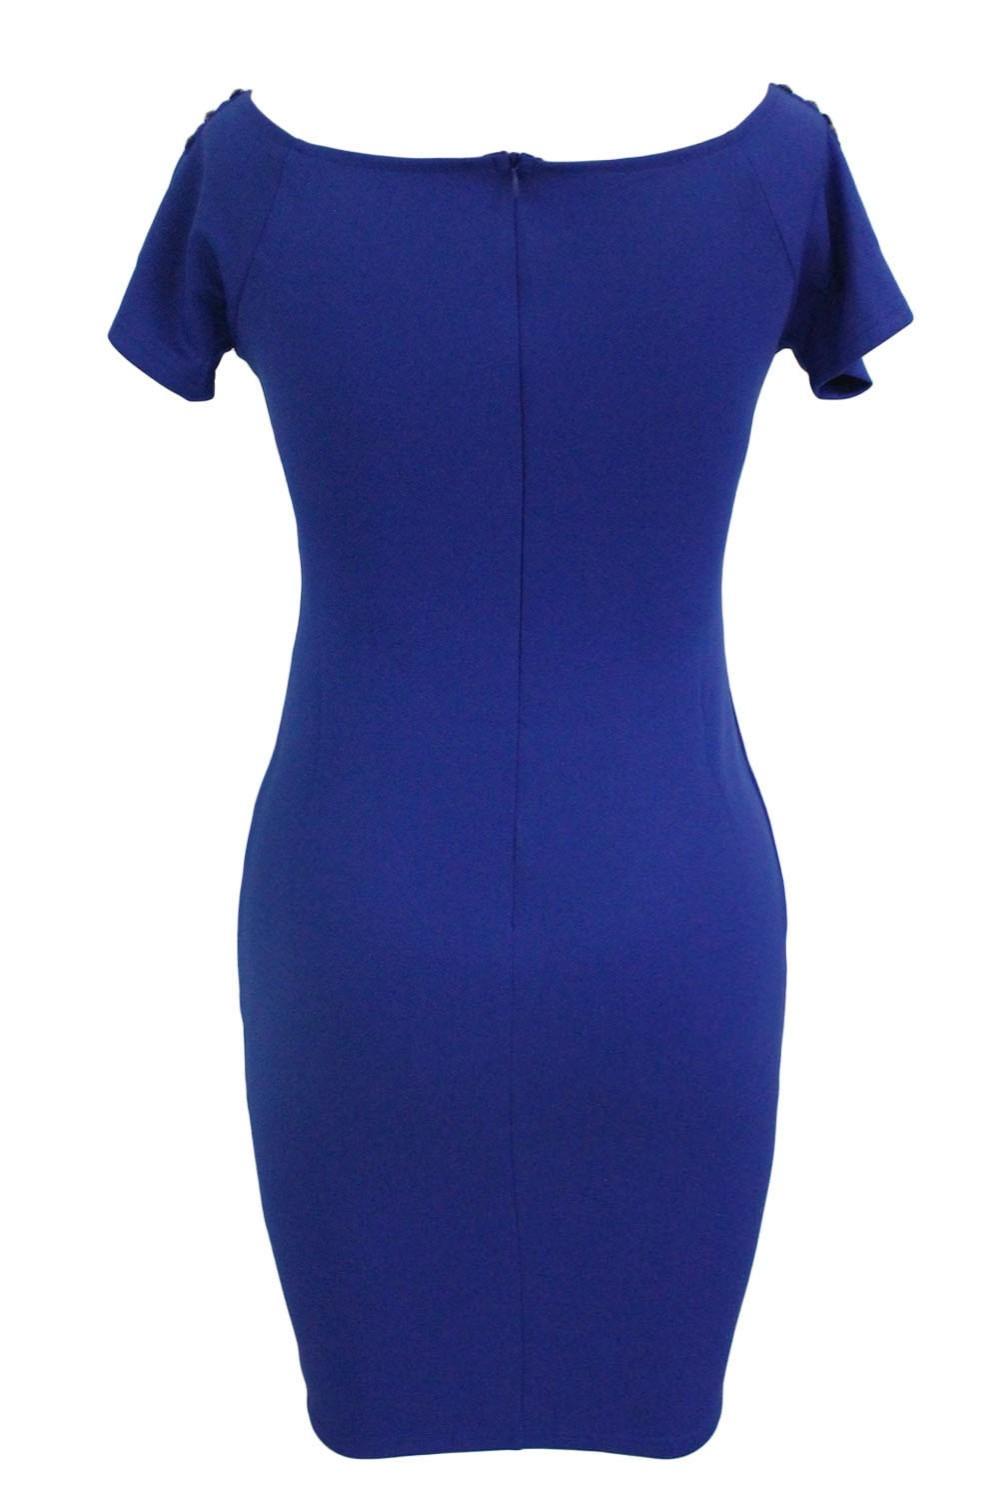 Studded-Off-Shoulder-Blue-Short-Sleeve-Bodycon-Dress-LC61188-5-3